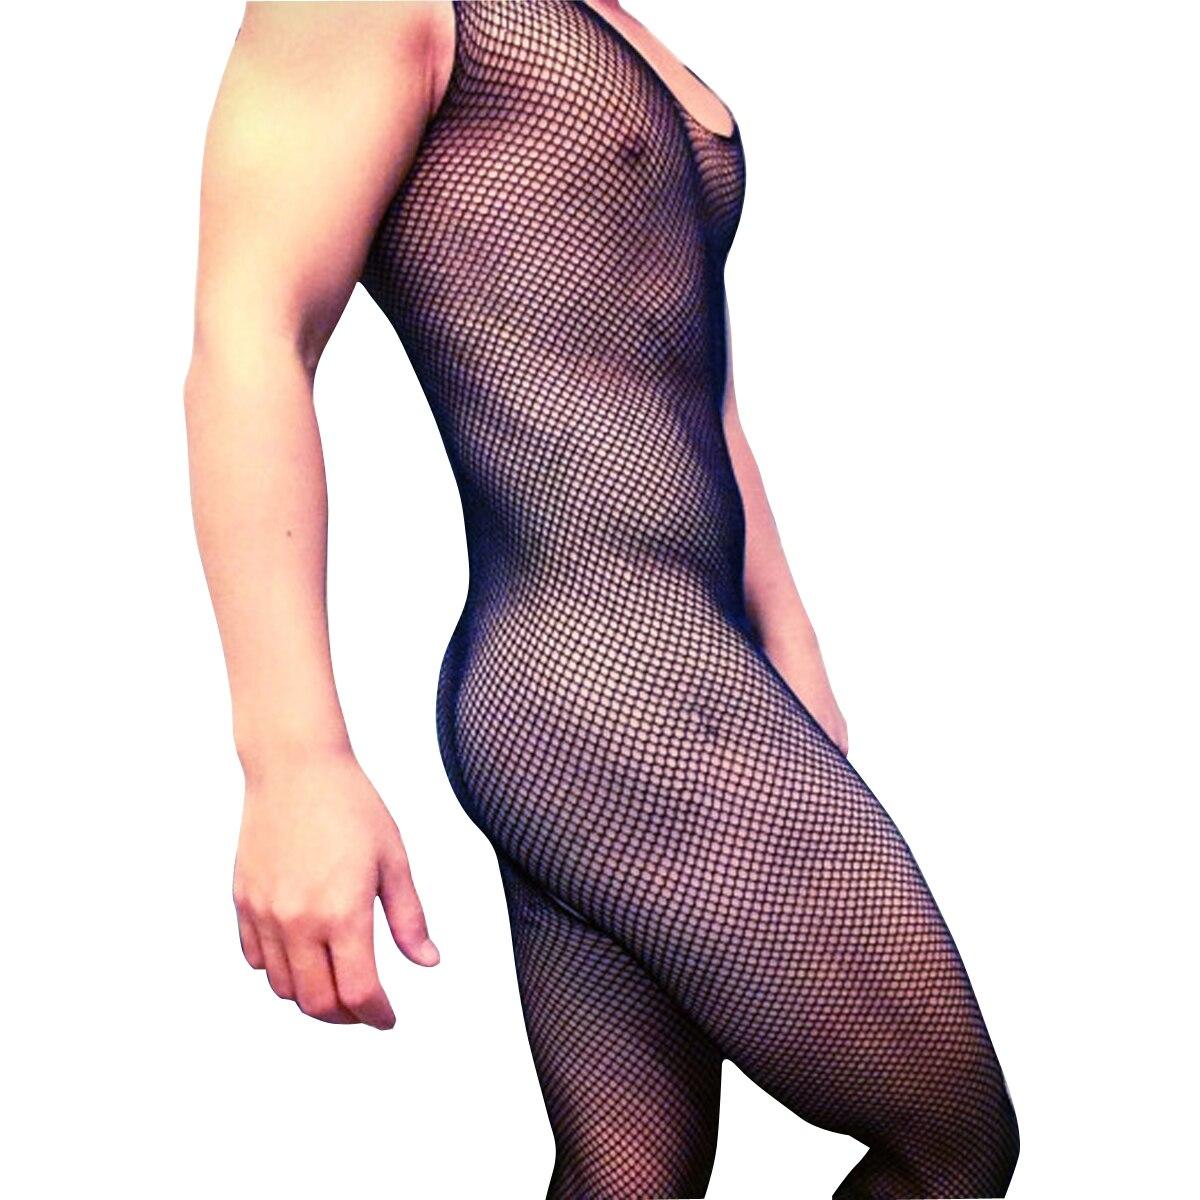 Sexy Men's Fishnet Body Stockings Open-Crotch Mens Pantyhose